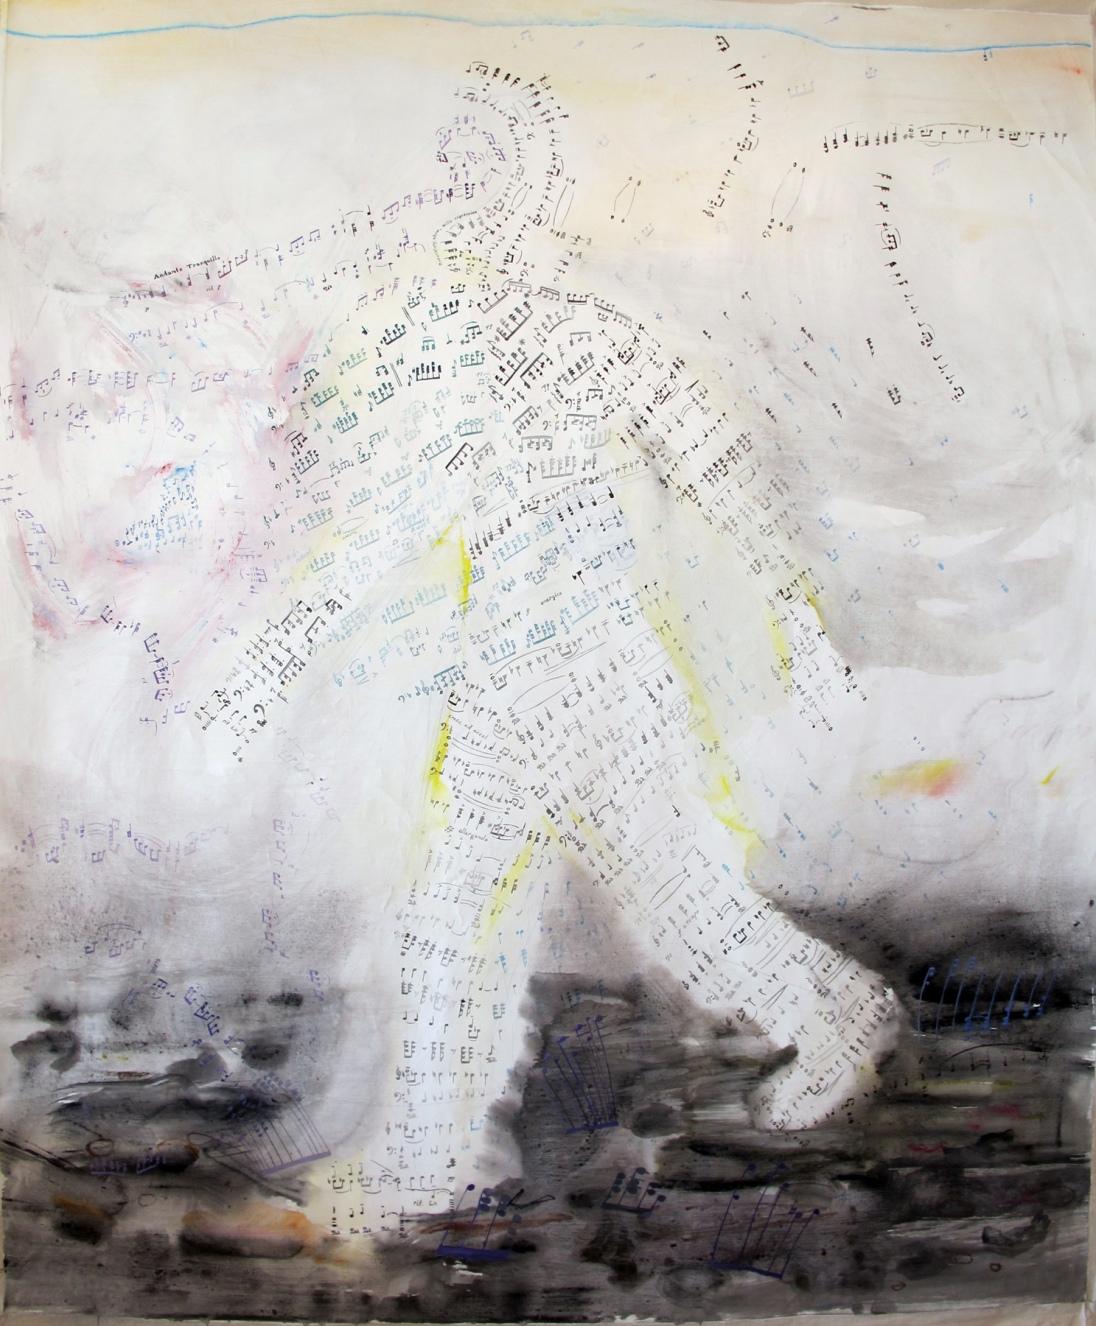 Oor, acrylic on canvas, 60 by 48 in. Emilia Kallock 2012